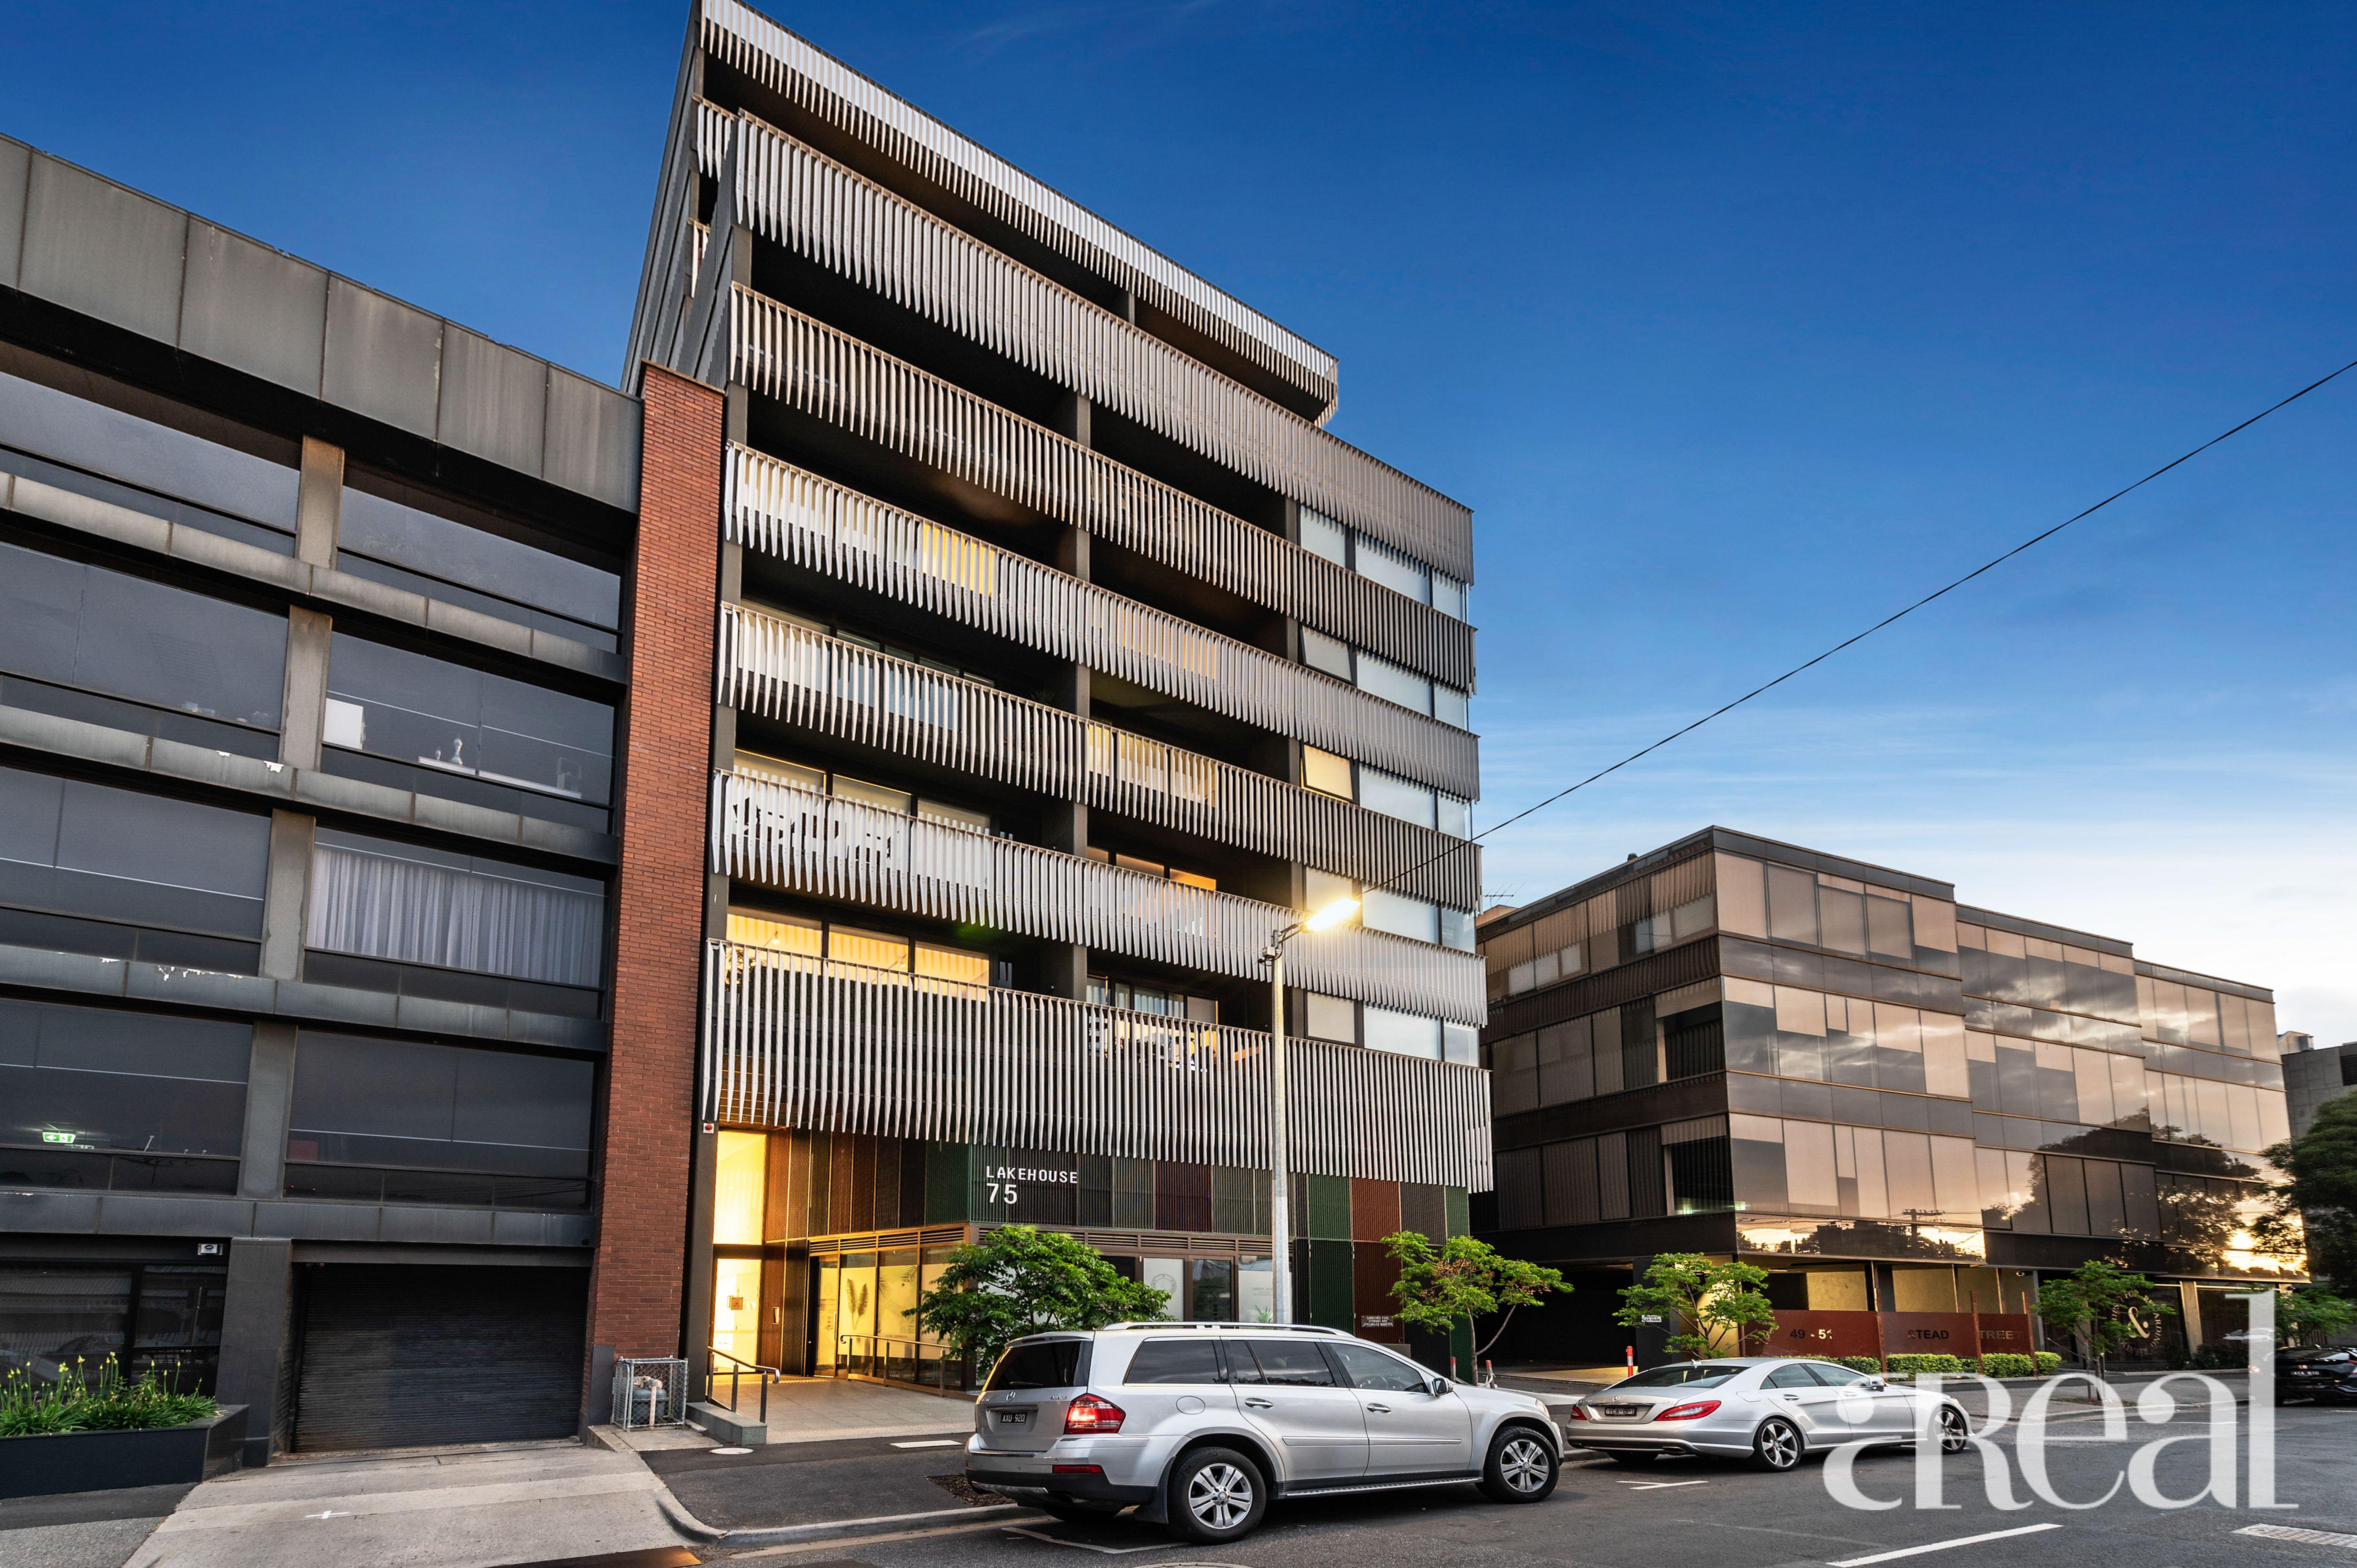 408/75 Palmerston Crescent, South Melbourne VIC 3205